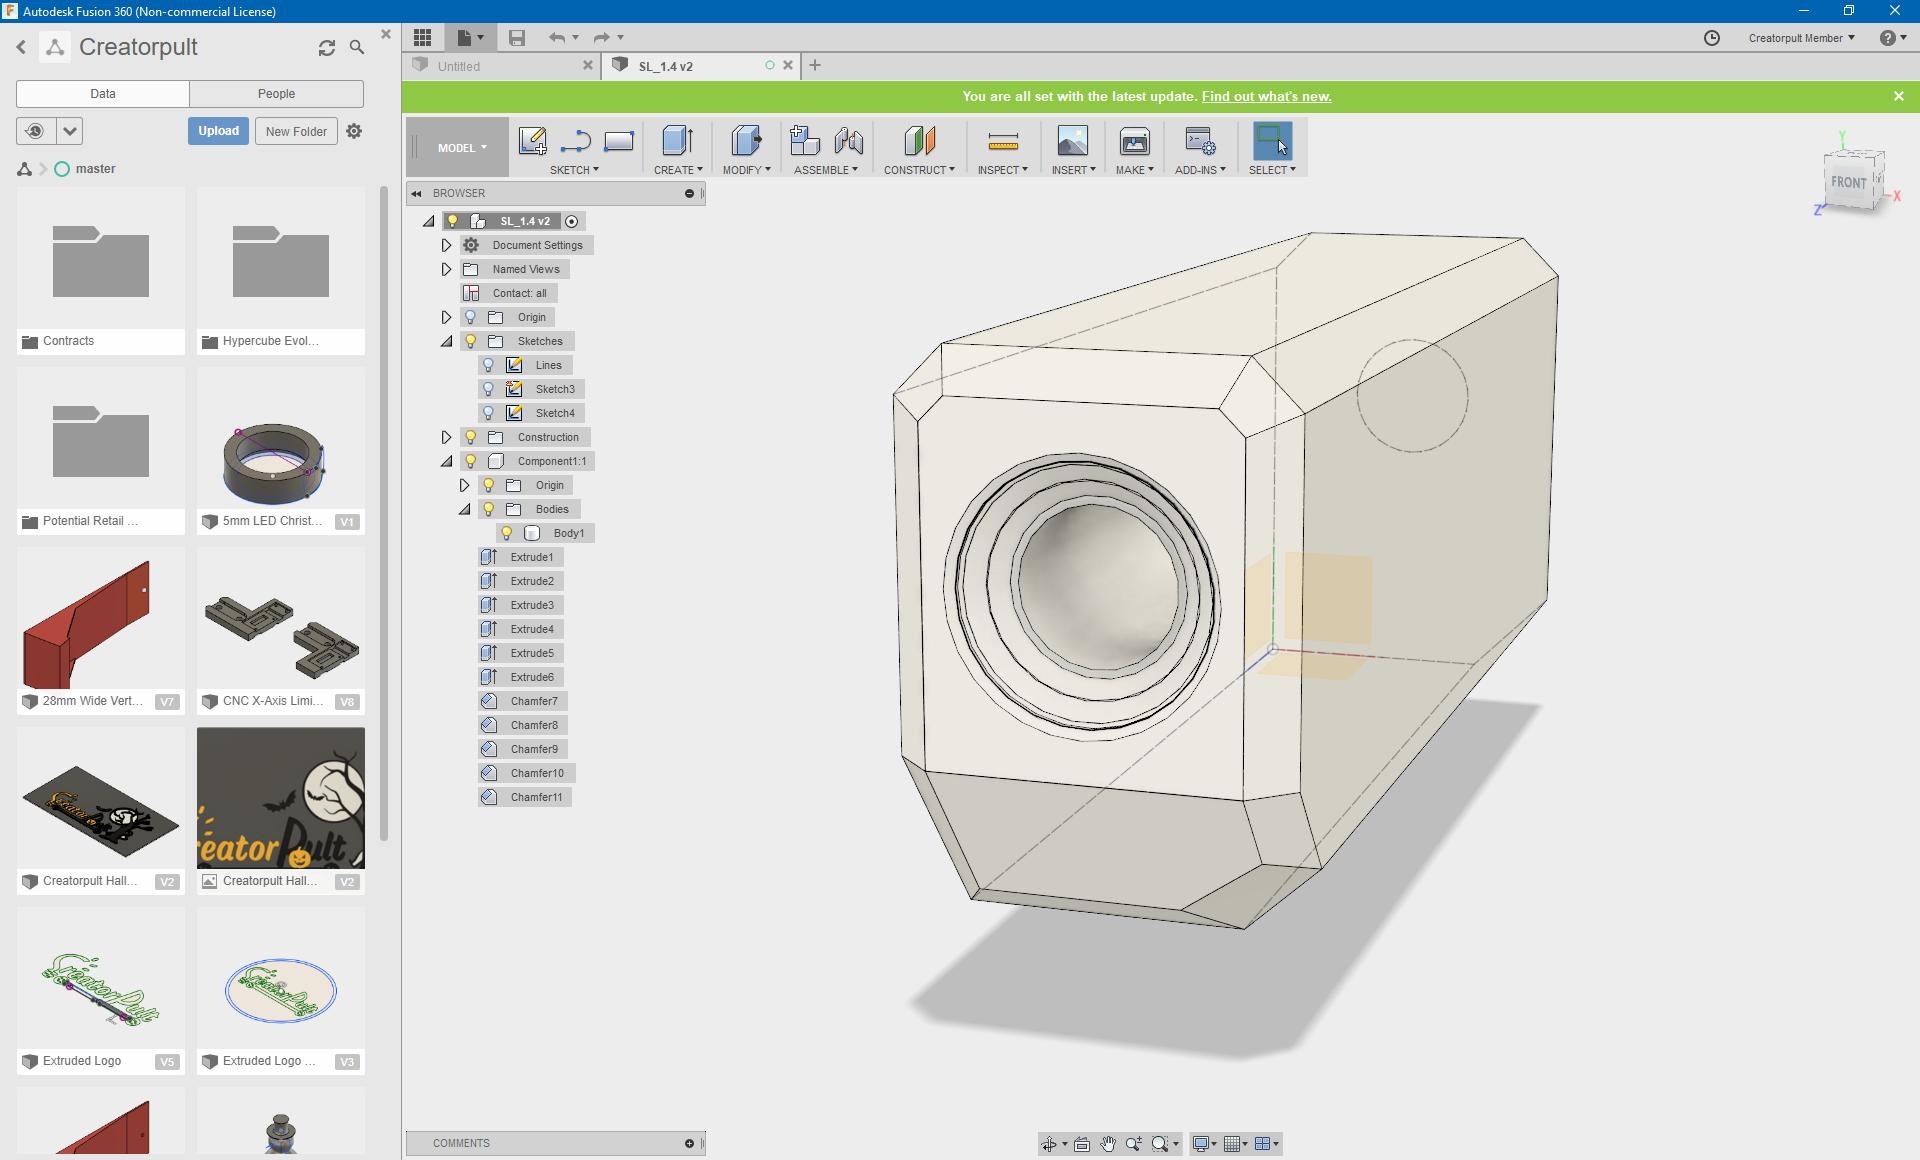 3D Design and Print Services - Design Manufacturing and Prototyping Services for Manufacturers and Entrepreneurs